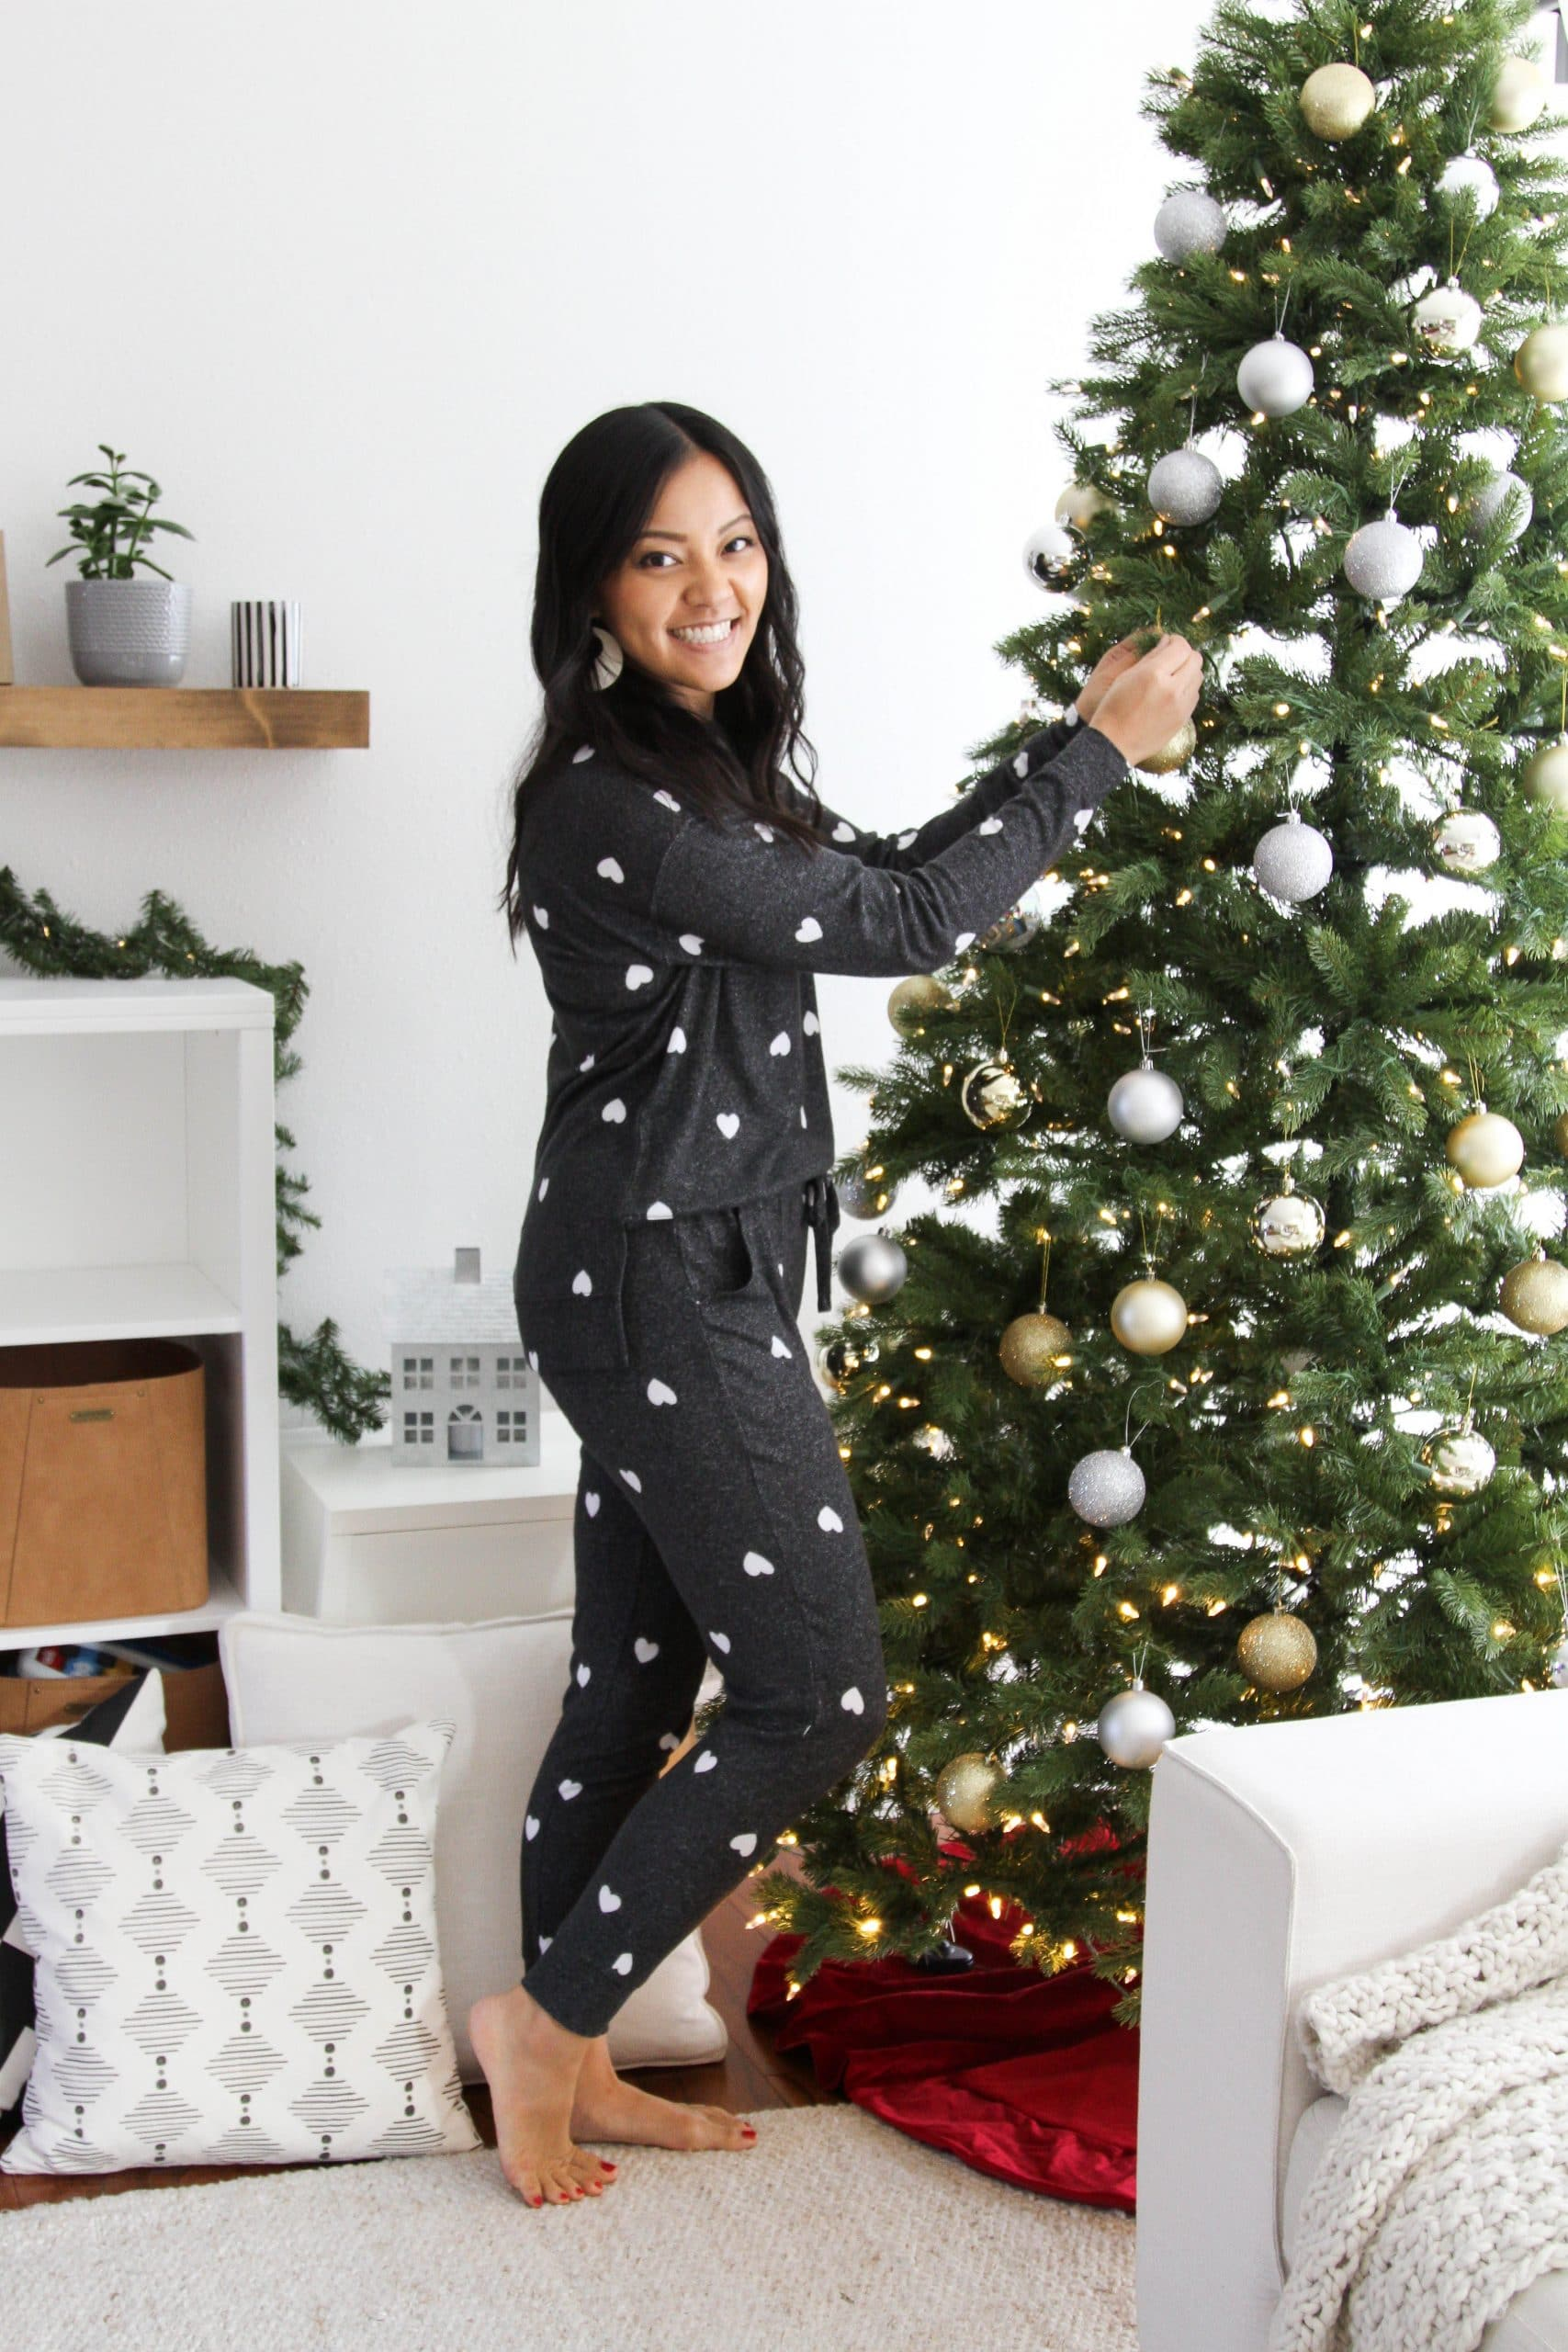 black and white heart pajamas + cute loungewear